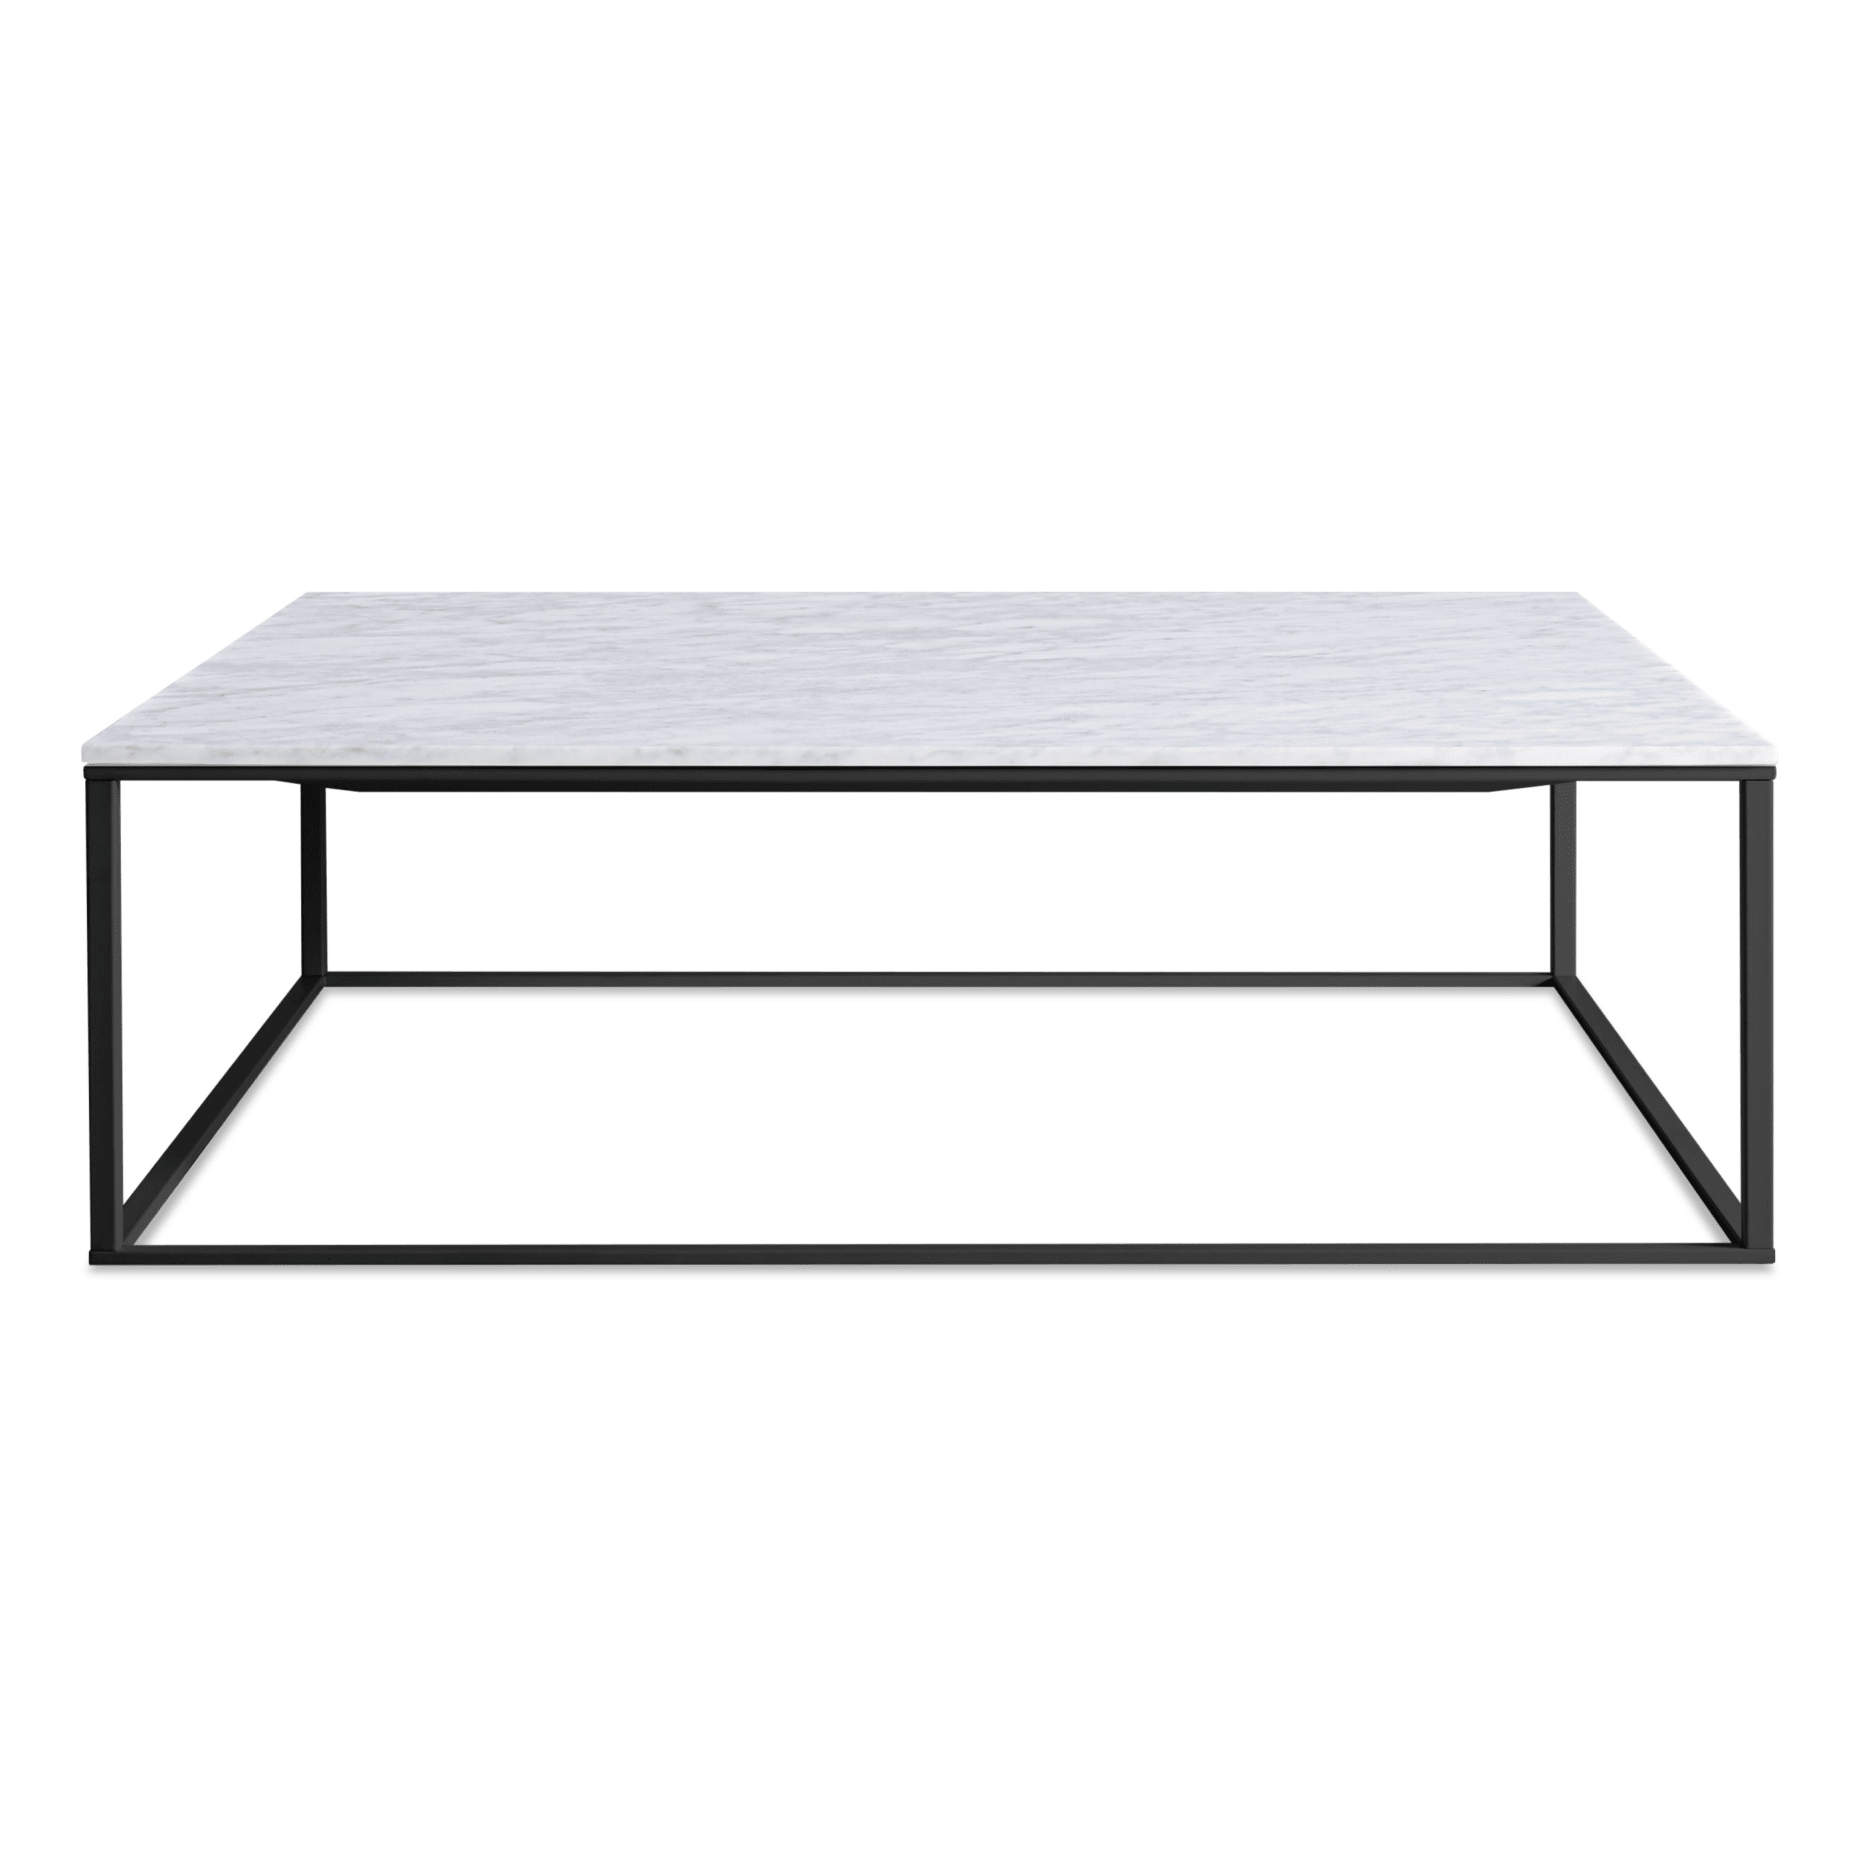 Minimalista Square Coffee Table Coffee Table Square Coffee Table Metal Modern Square Coffee Table